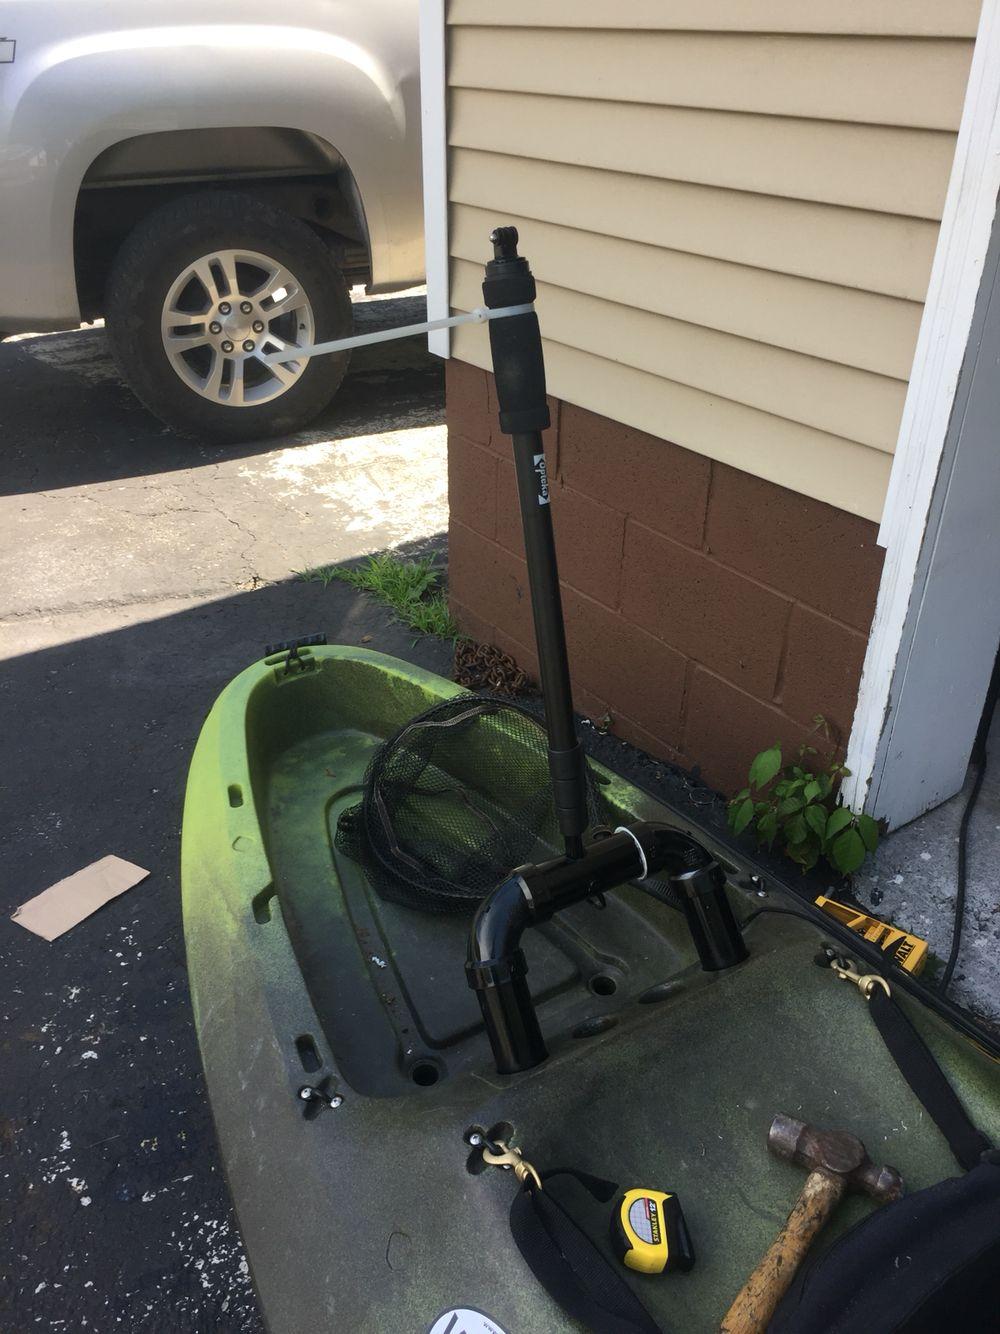 2 inch pvc custom built go pro mount perception kayak | Kayaking